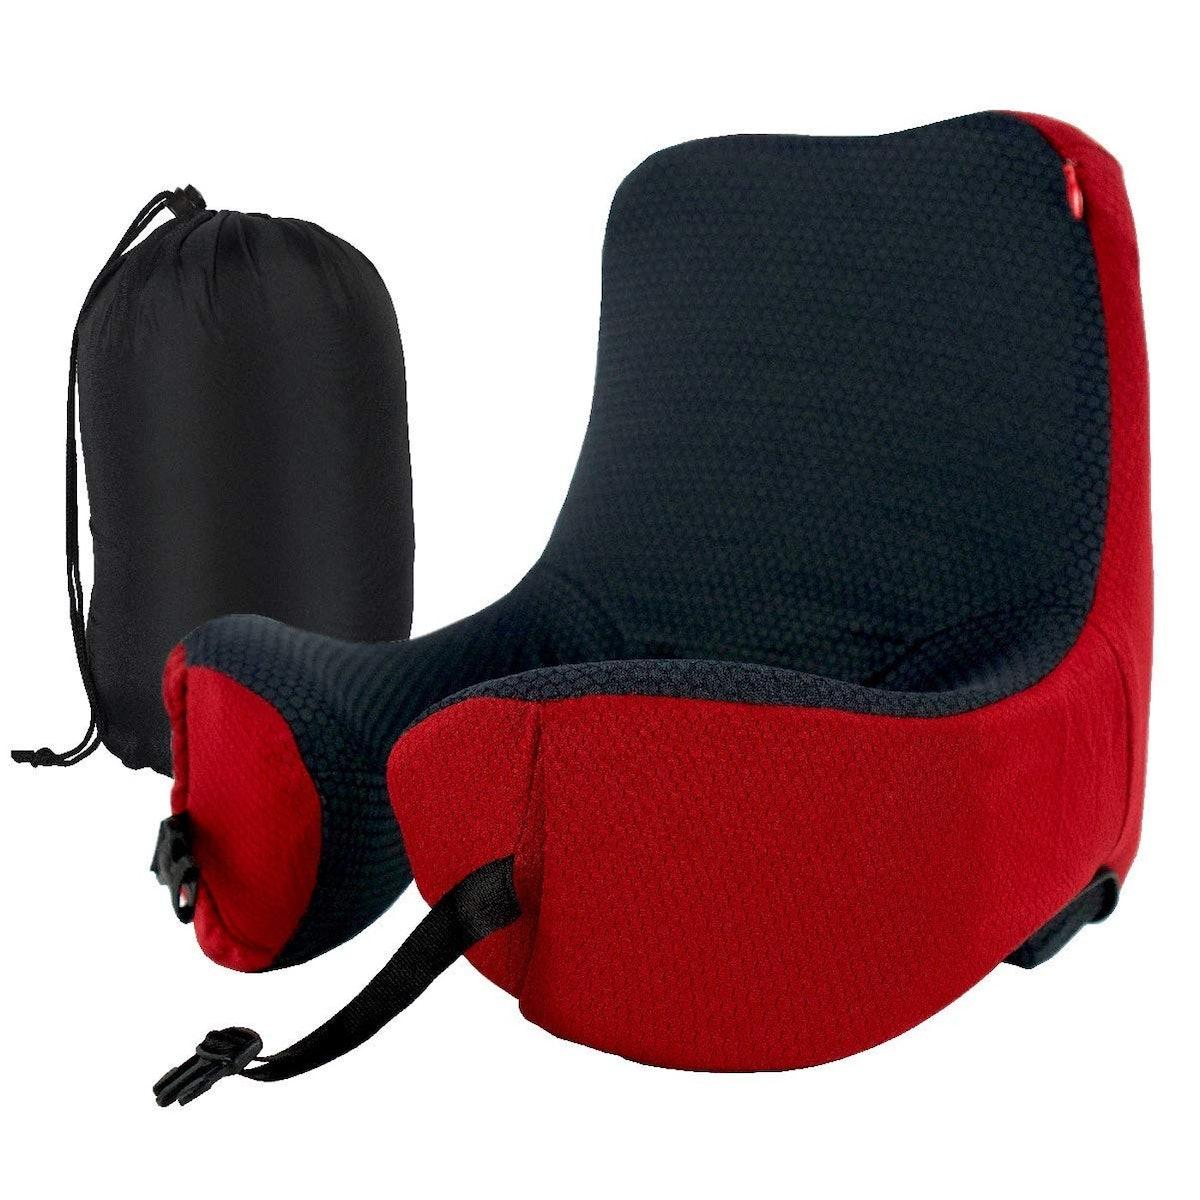 FavFactory Travel Neck Pillow